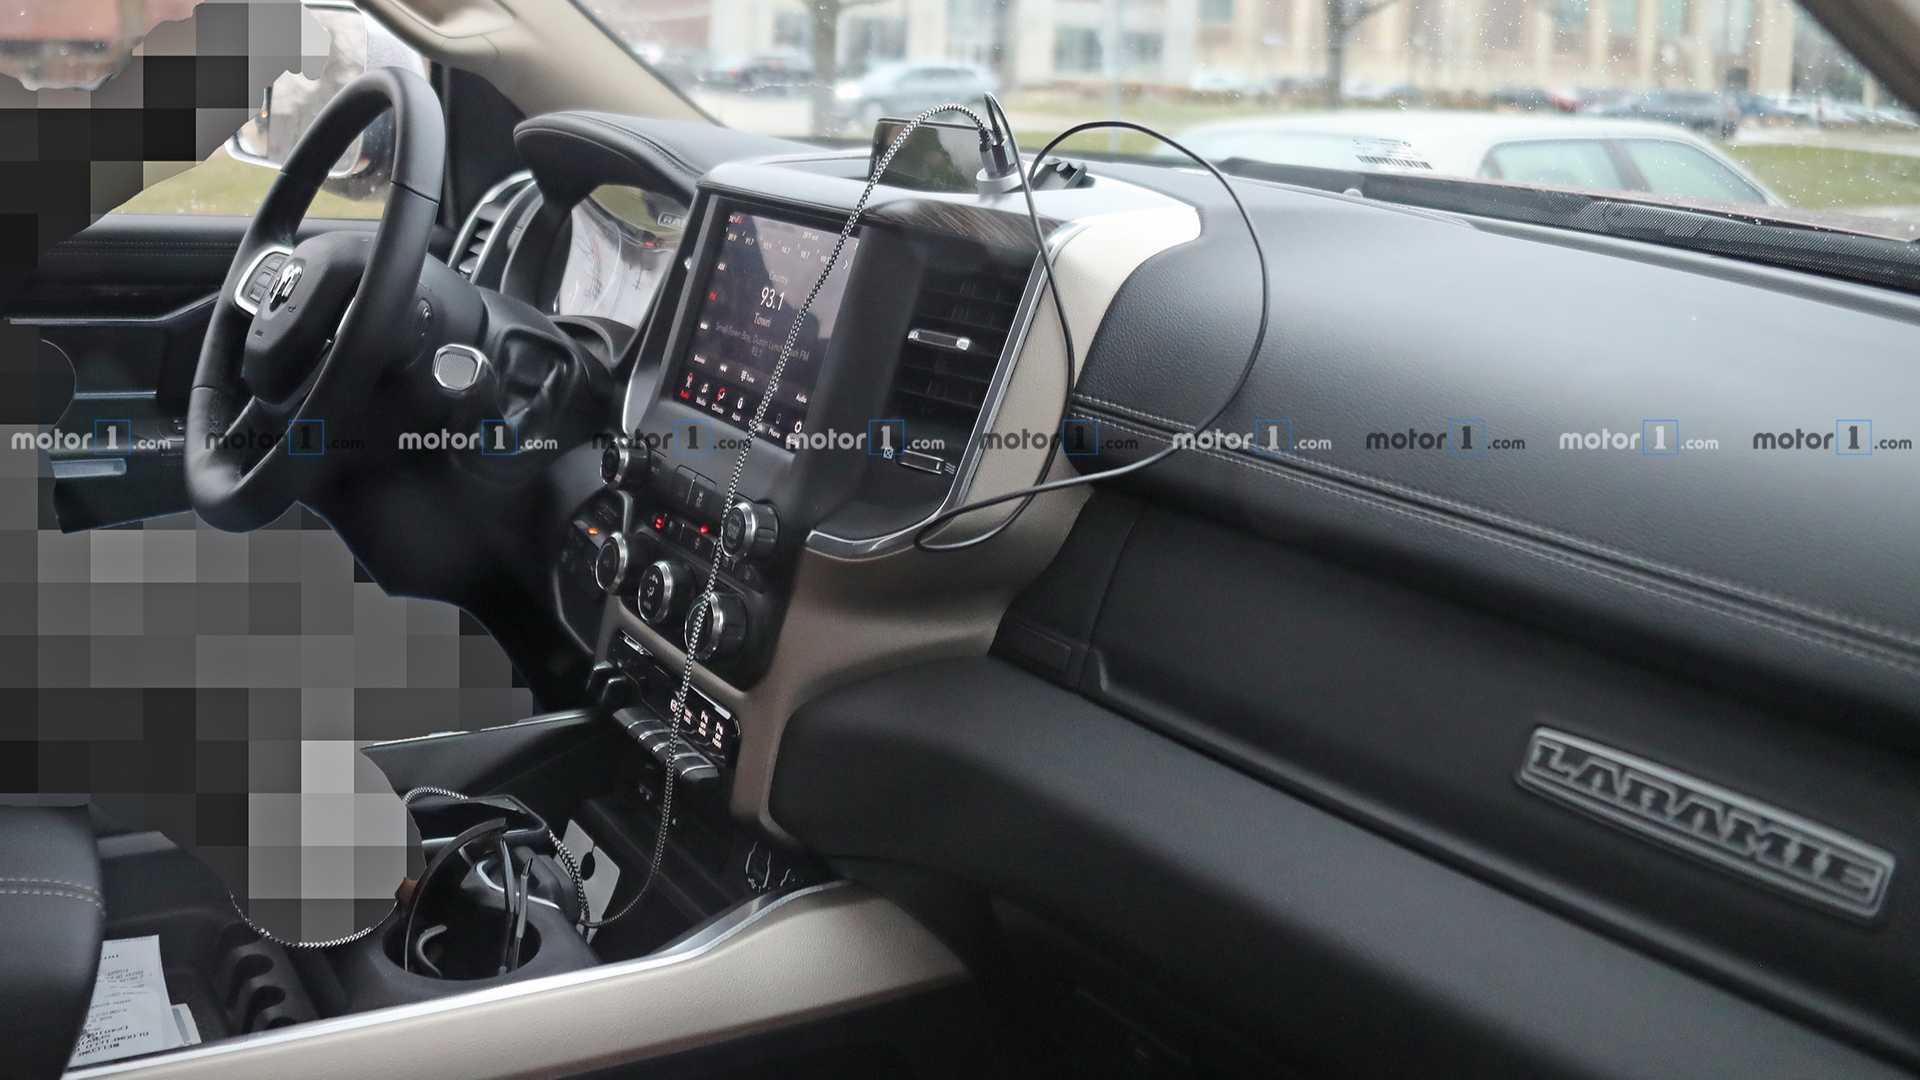 23 All New 2020 Dodge Ram Interior Interior by 2020 Dodge Ram Interior